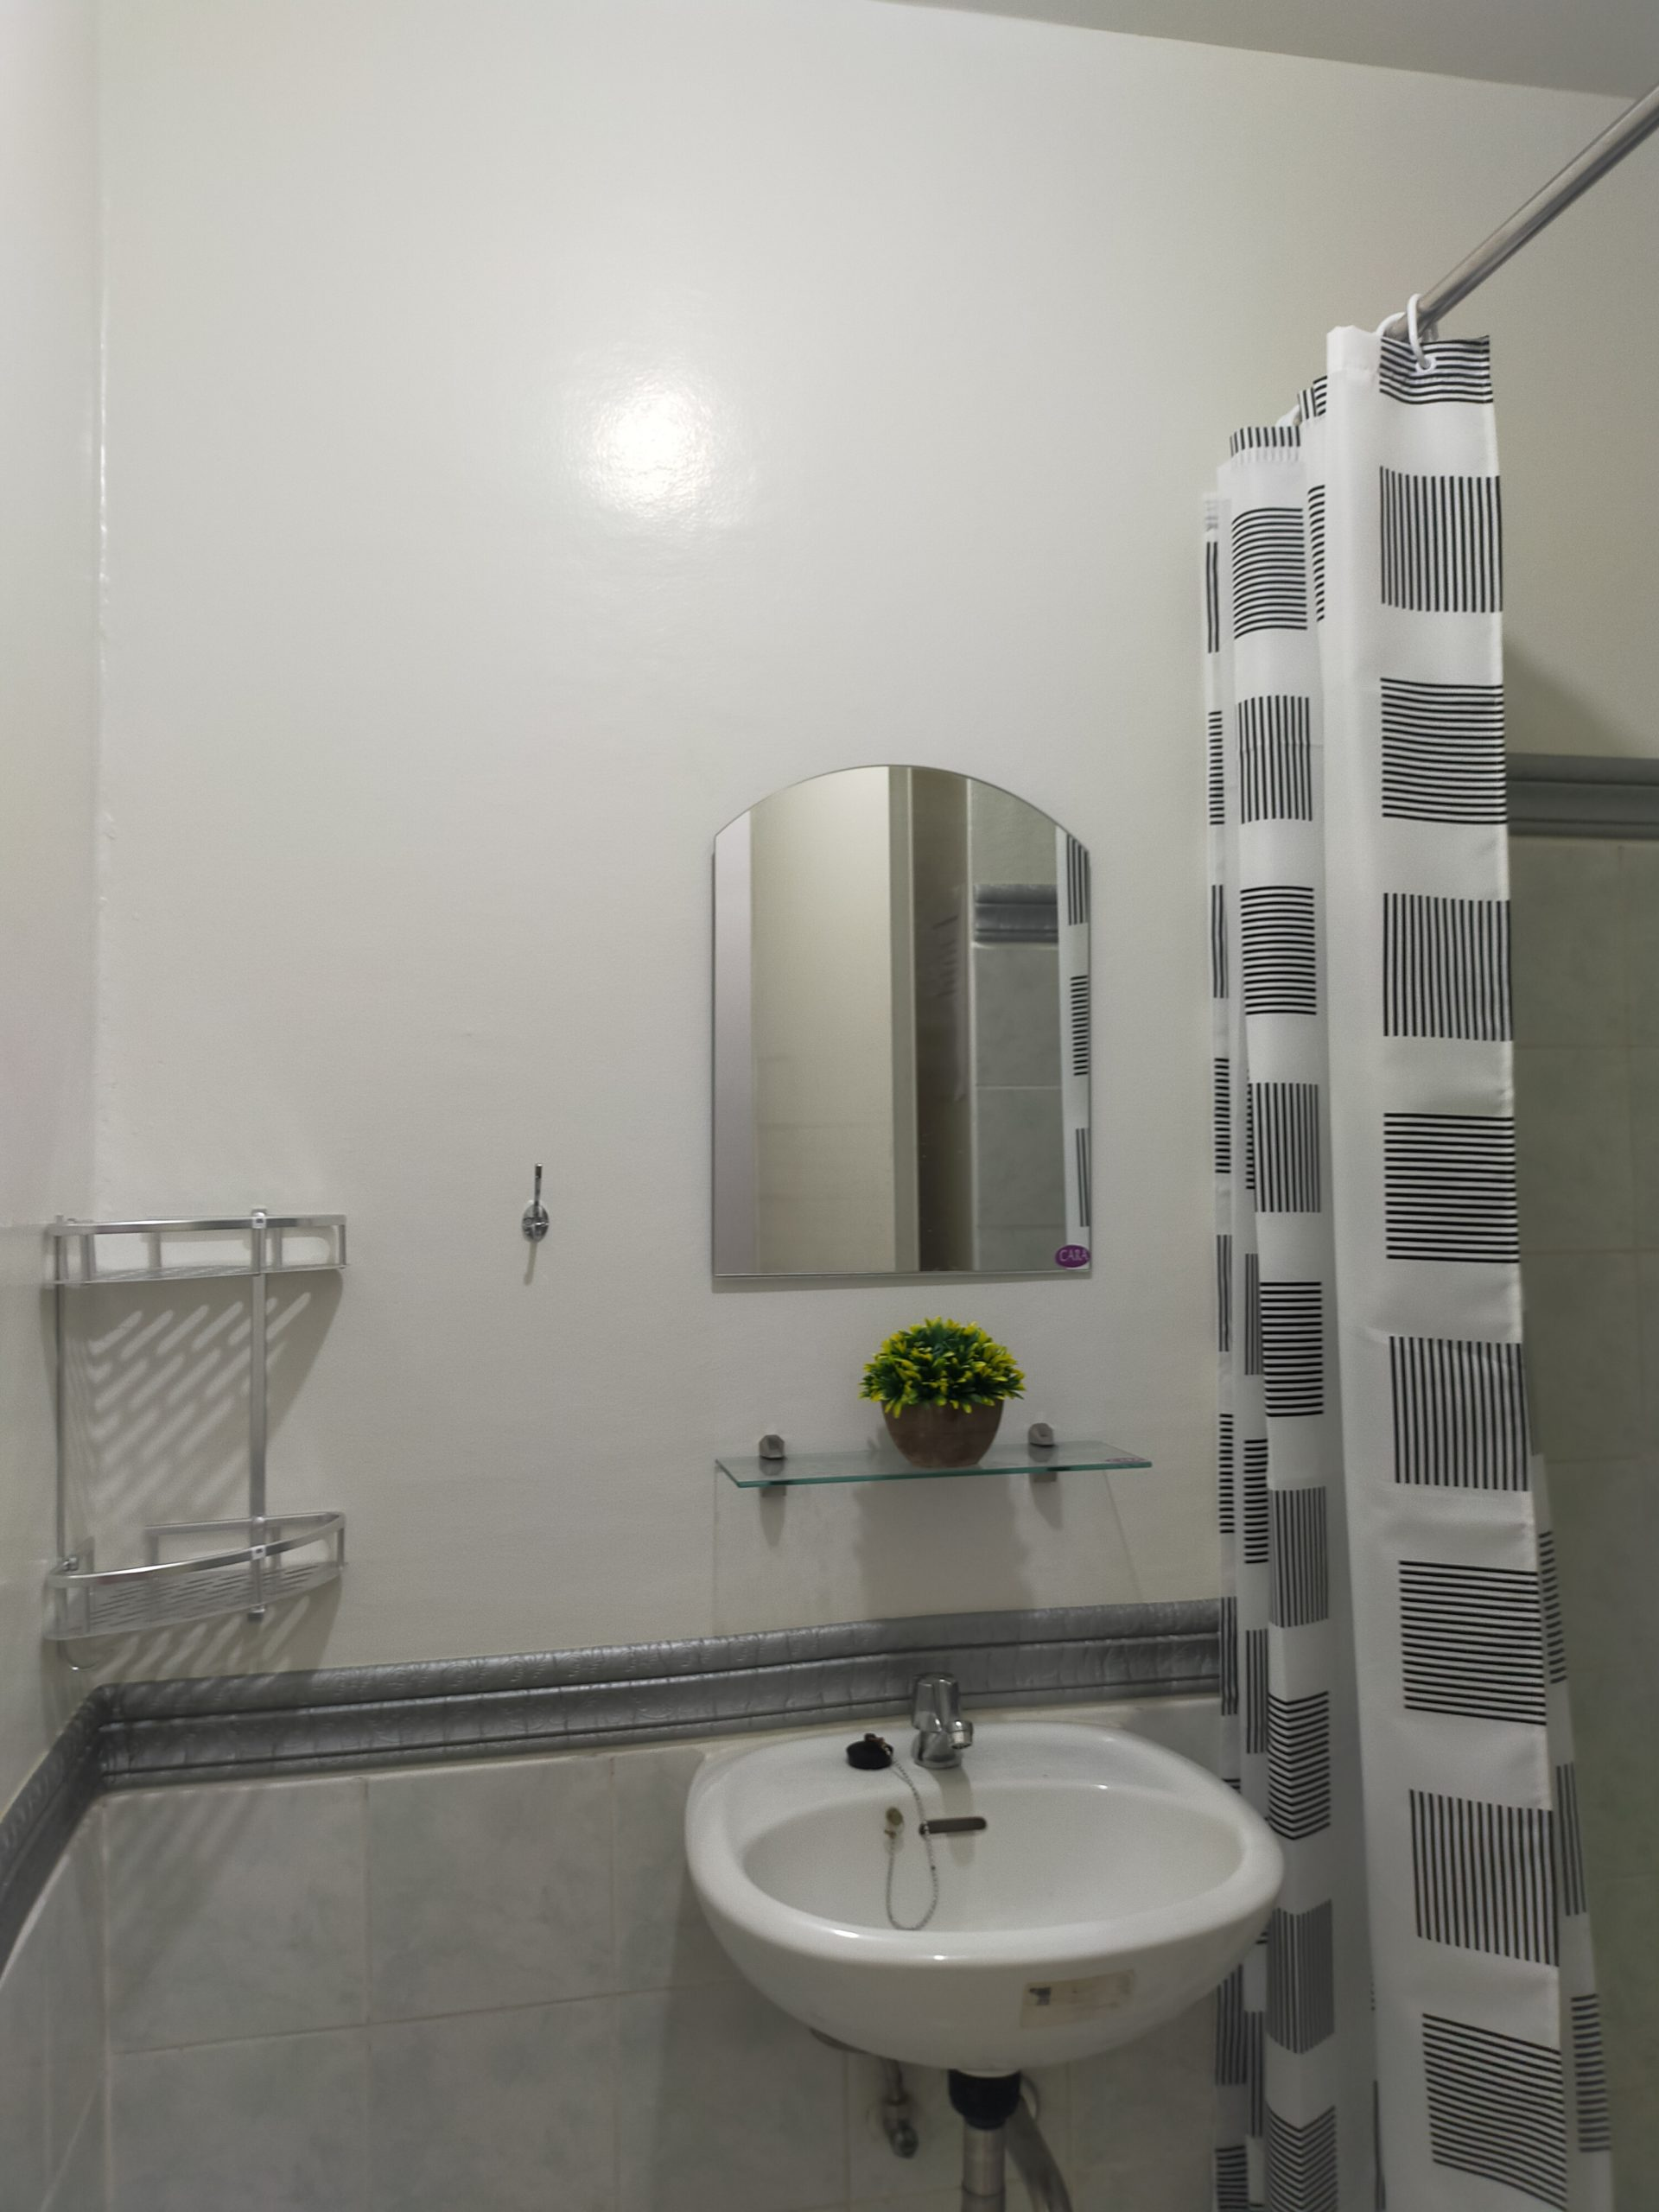 Male Condo Bedspace in Sucat, Muntinlupa/Paranaque